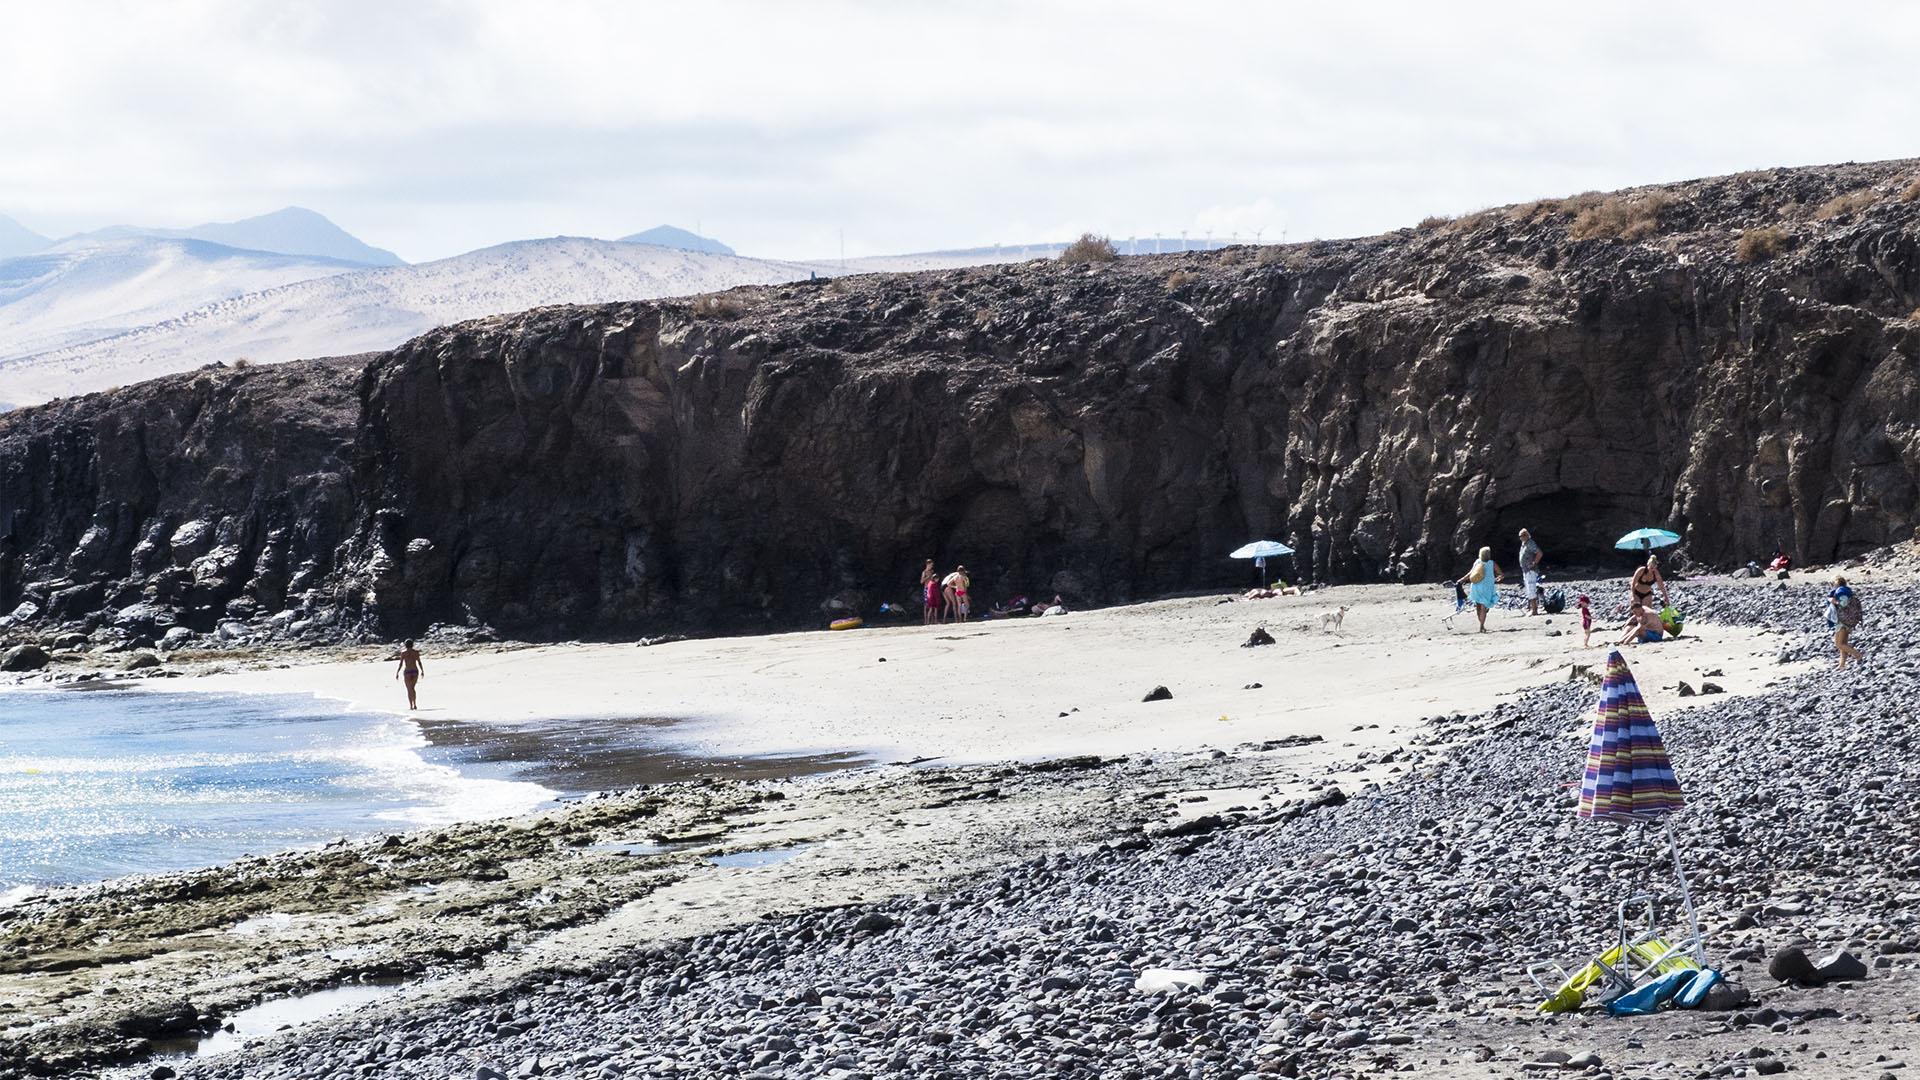 Die Strände Fuerteventuras: La Lajita, Playa de la Jaqueta.